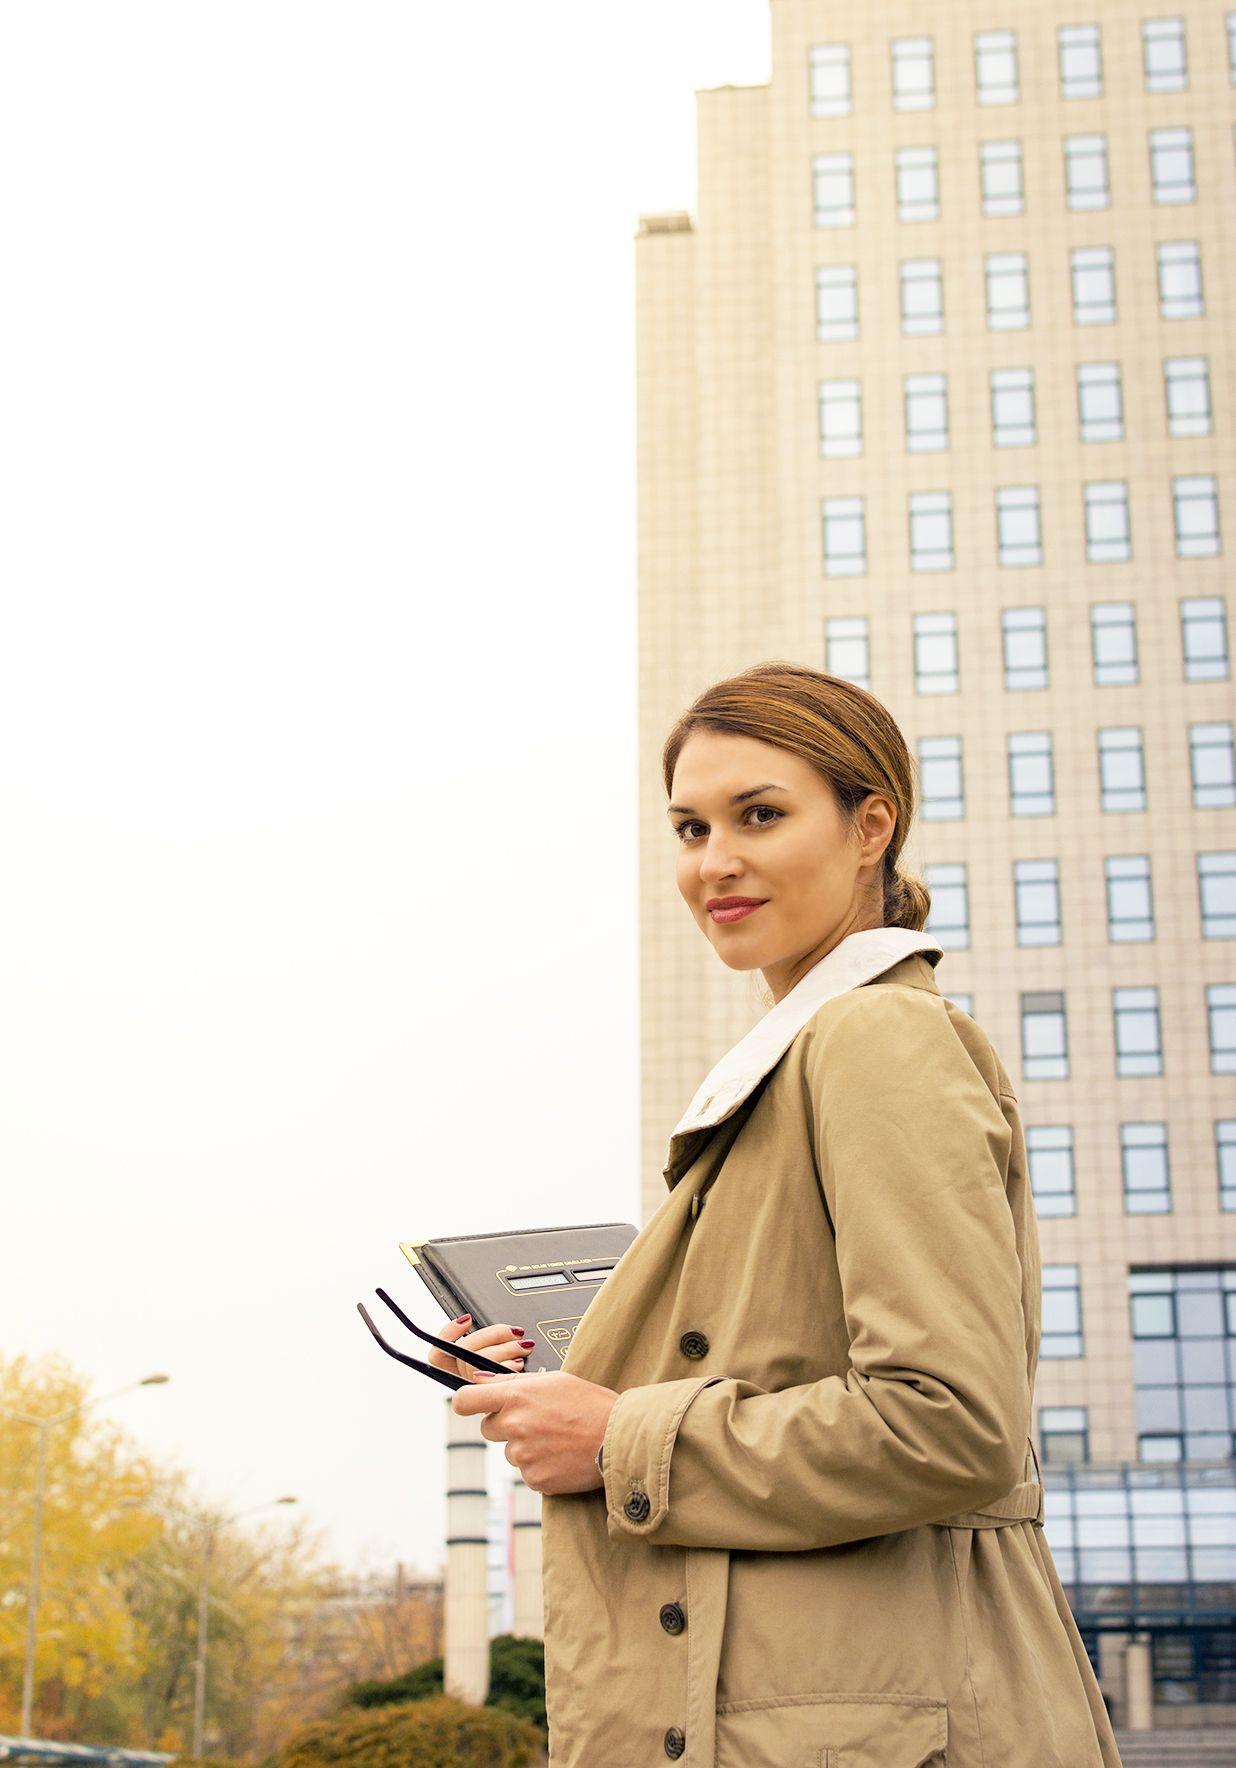 Business woman #portrait #business #girl